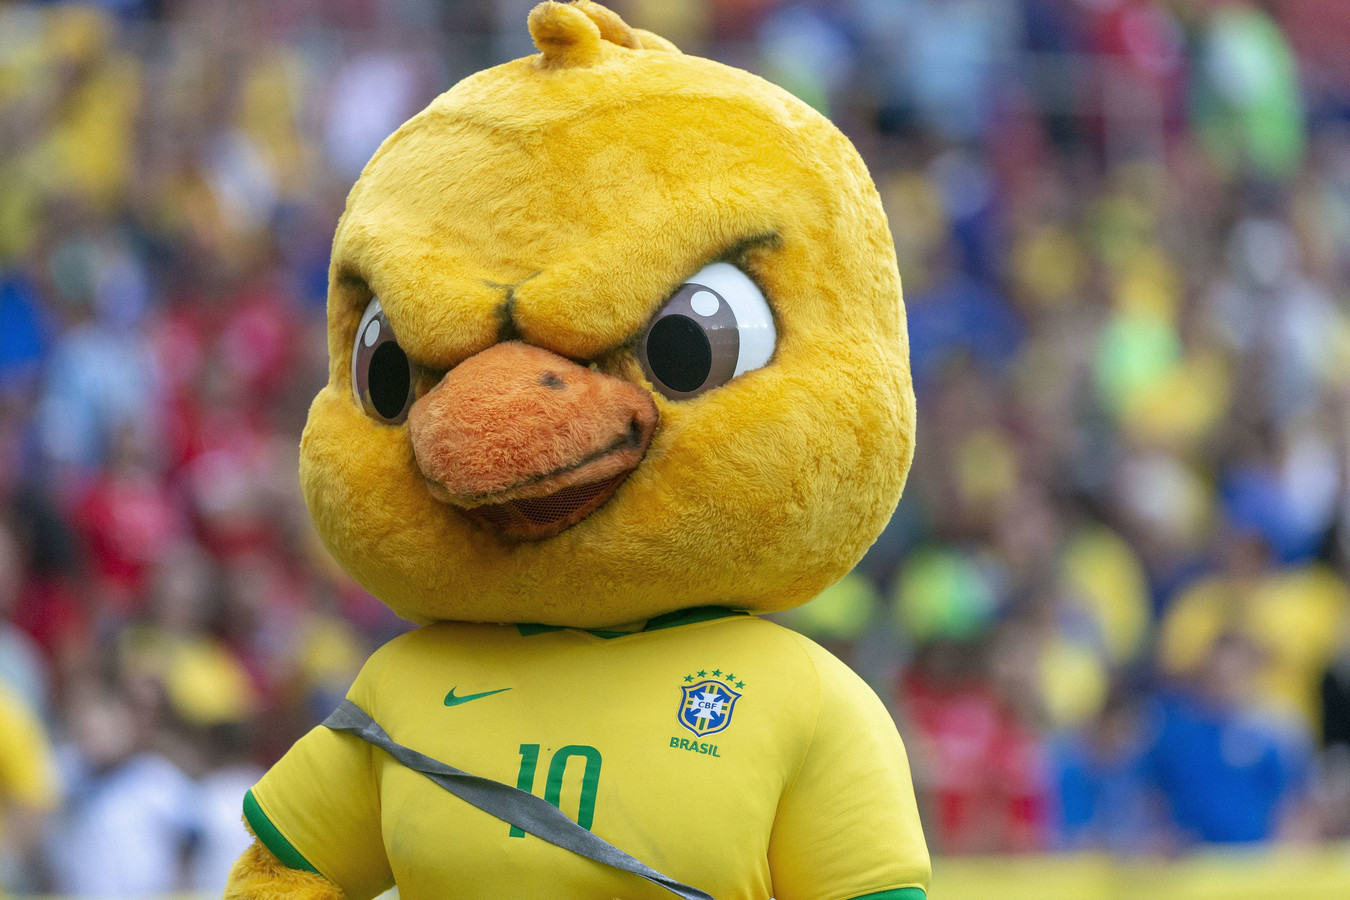 De Braziliaanse mascotte.